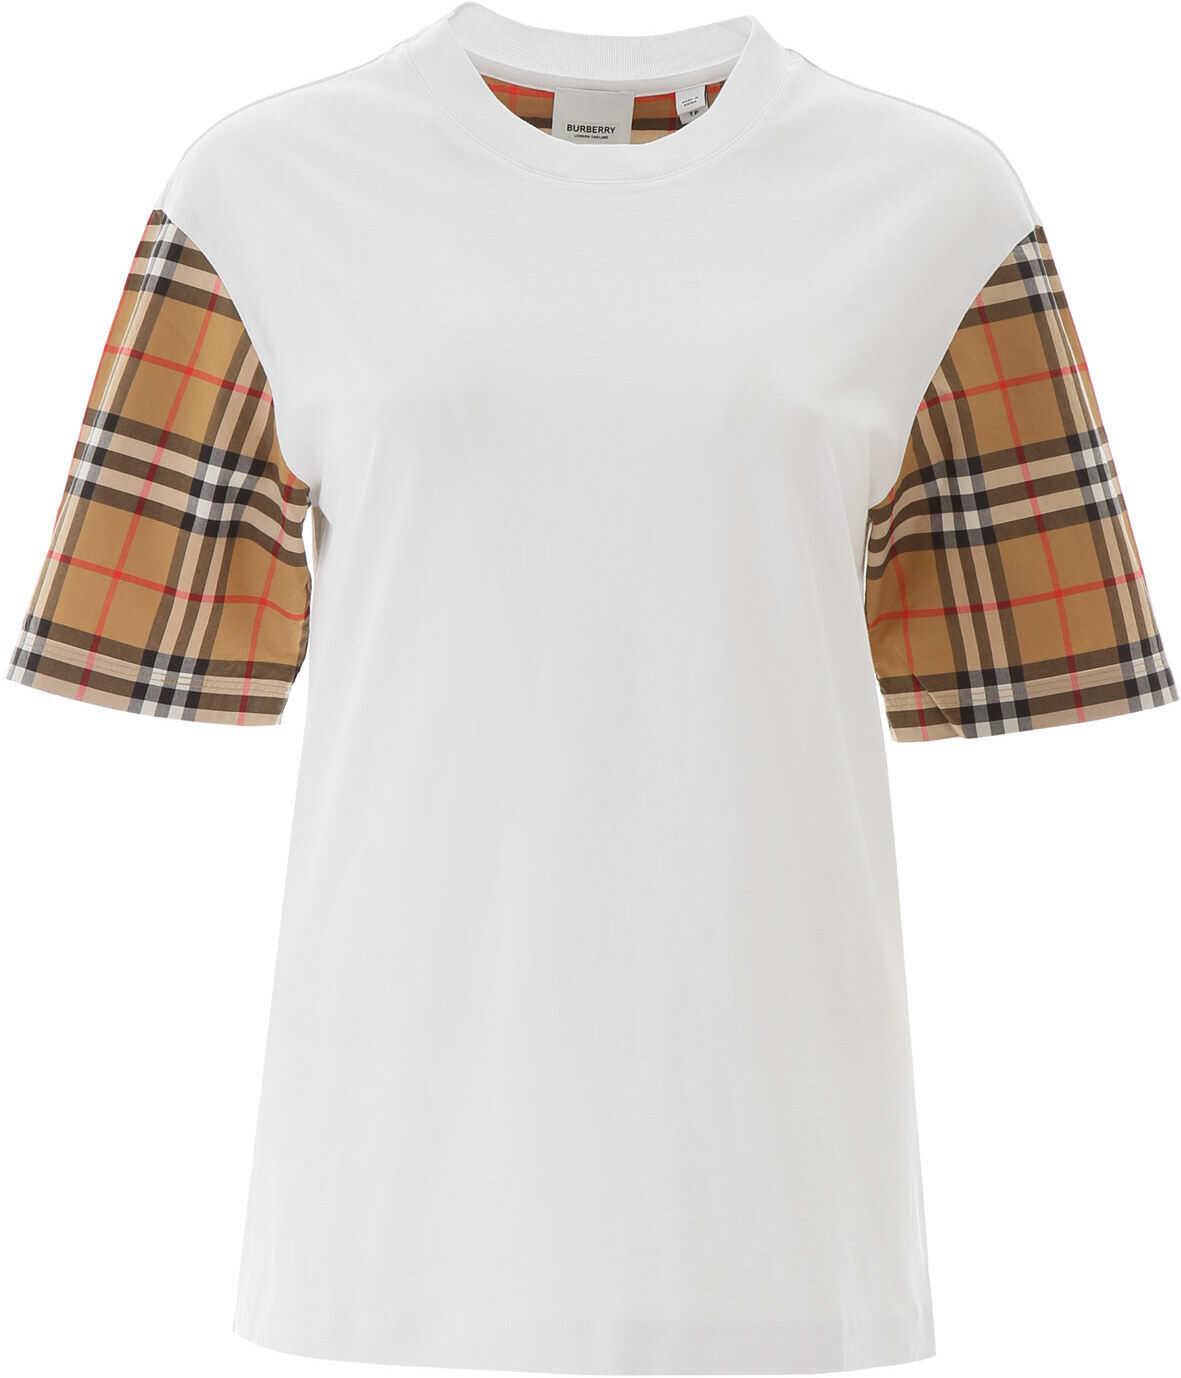 Burberry Serra T-Shirt WHITE